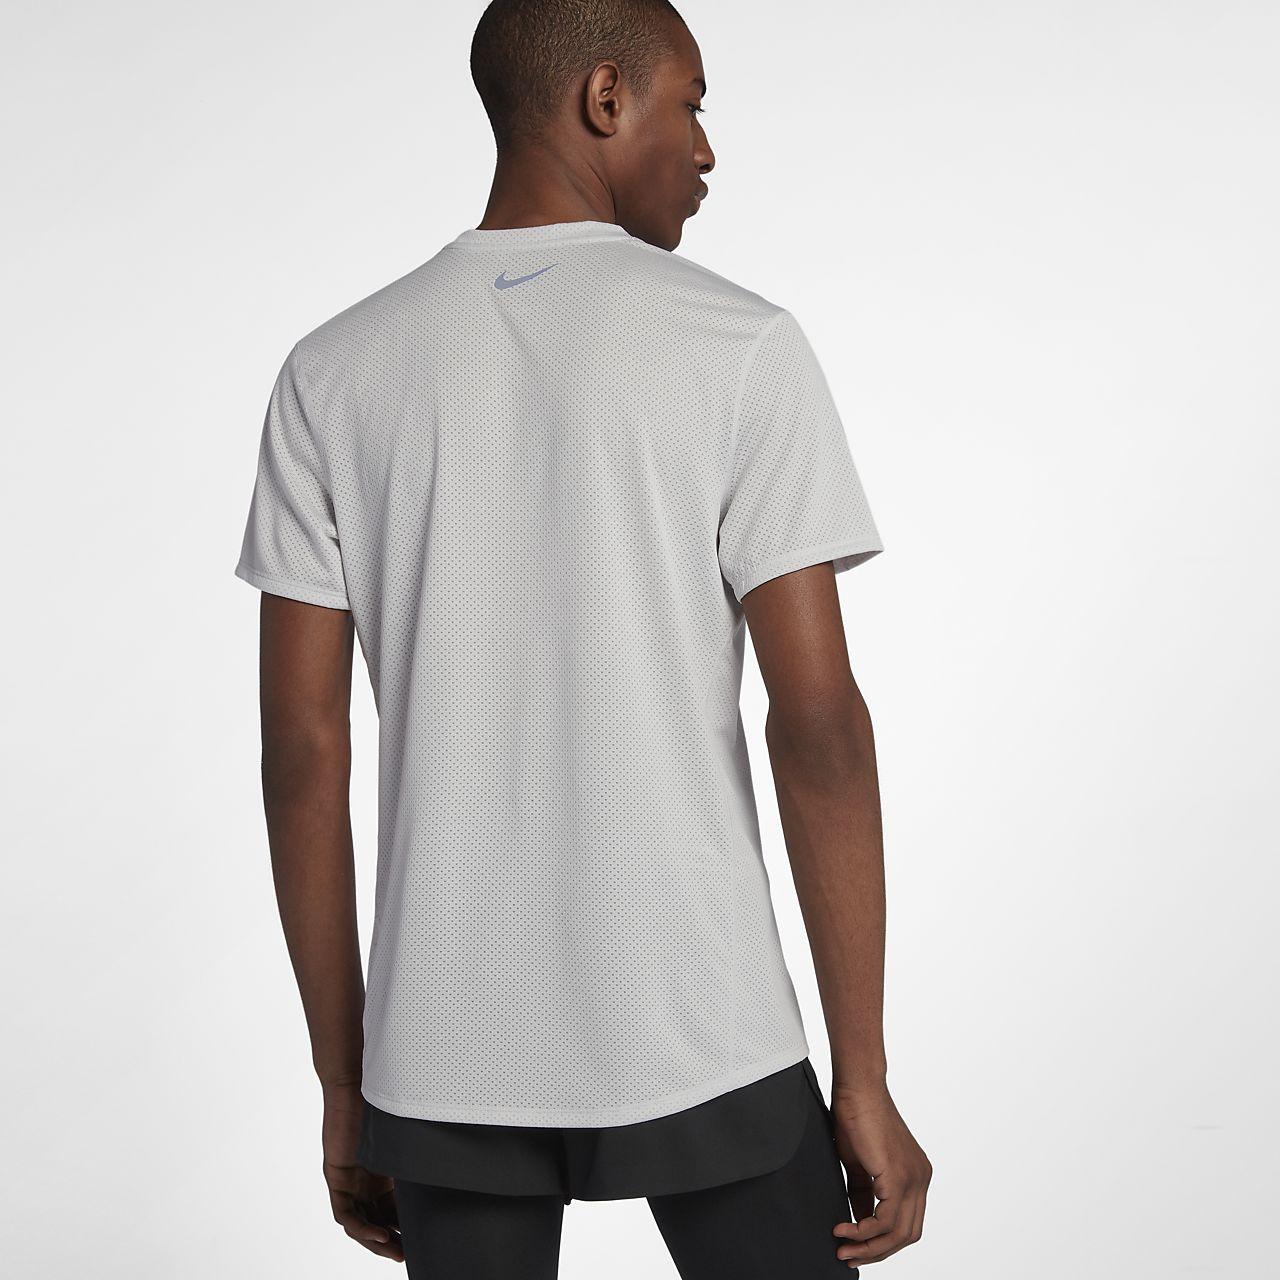 ... Nike Dri-FIT Miler Cool Men's Short-Sleeve Running Top